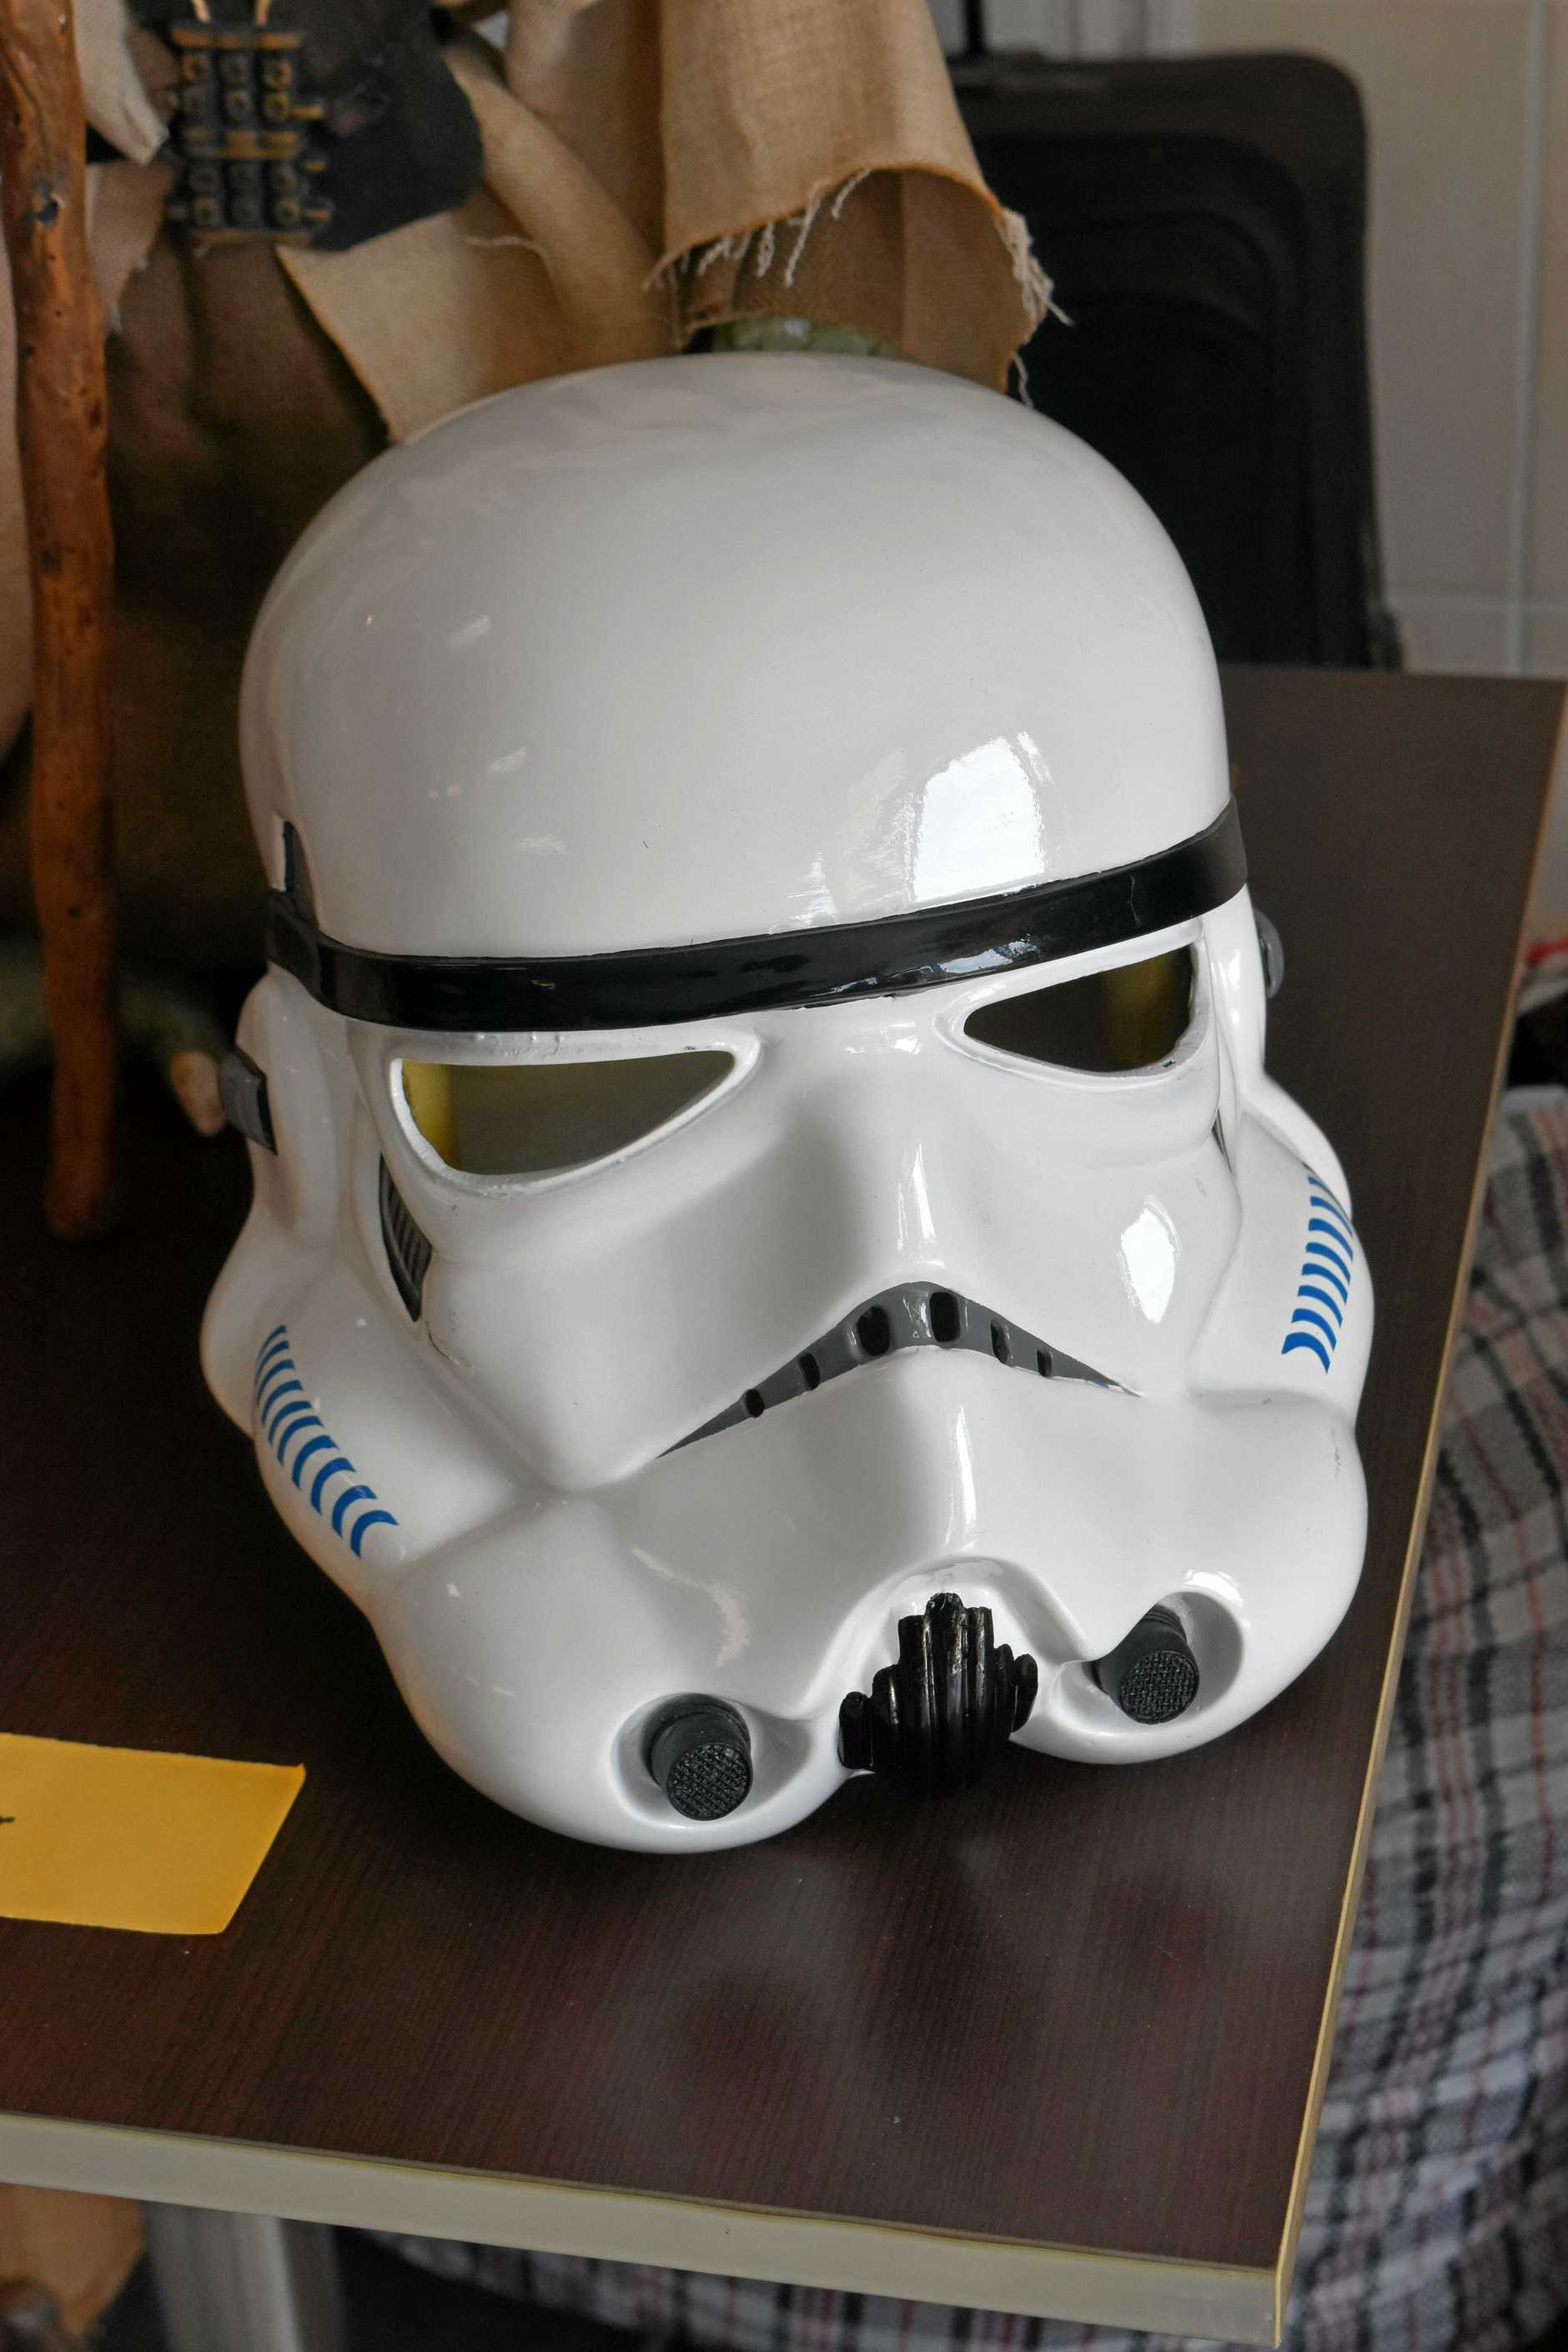 A full-size storm trooper helmet.